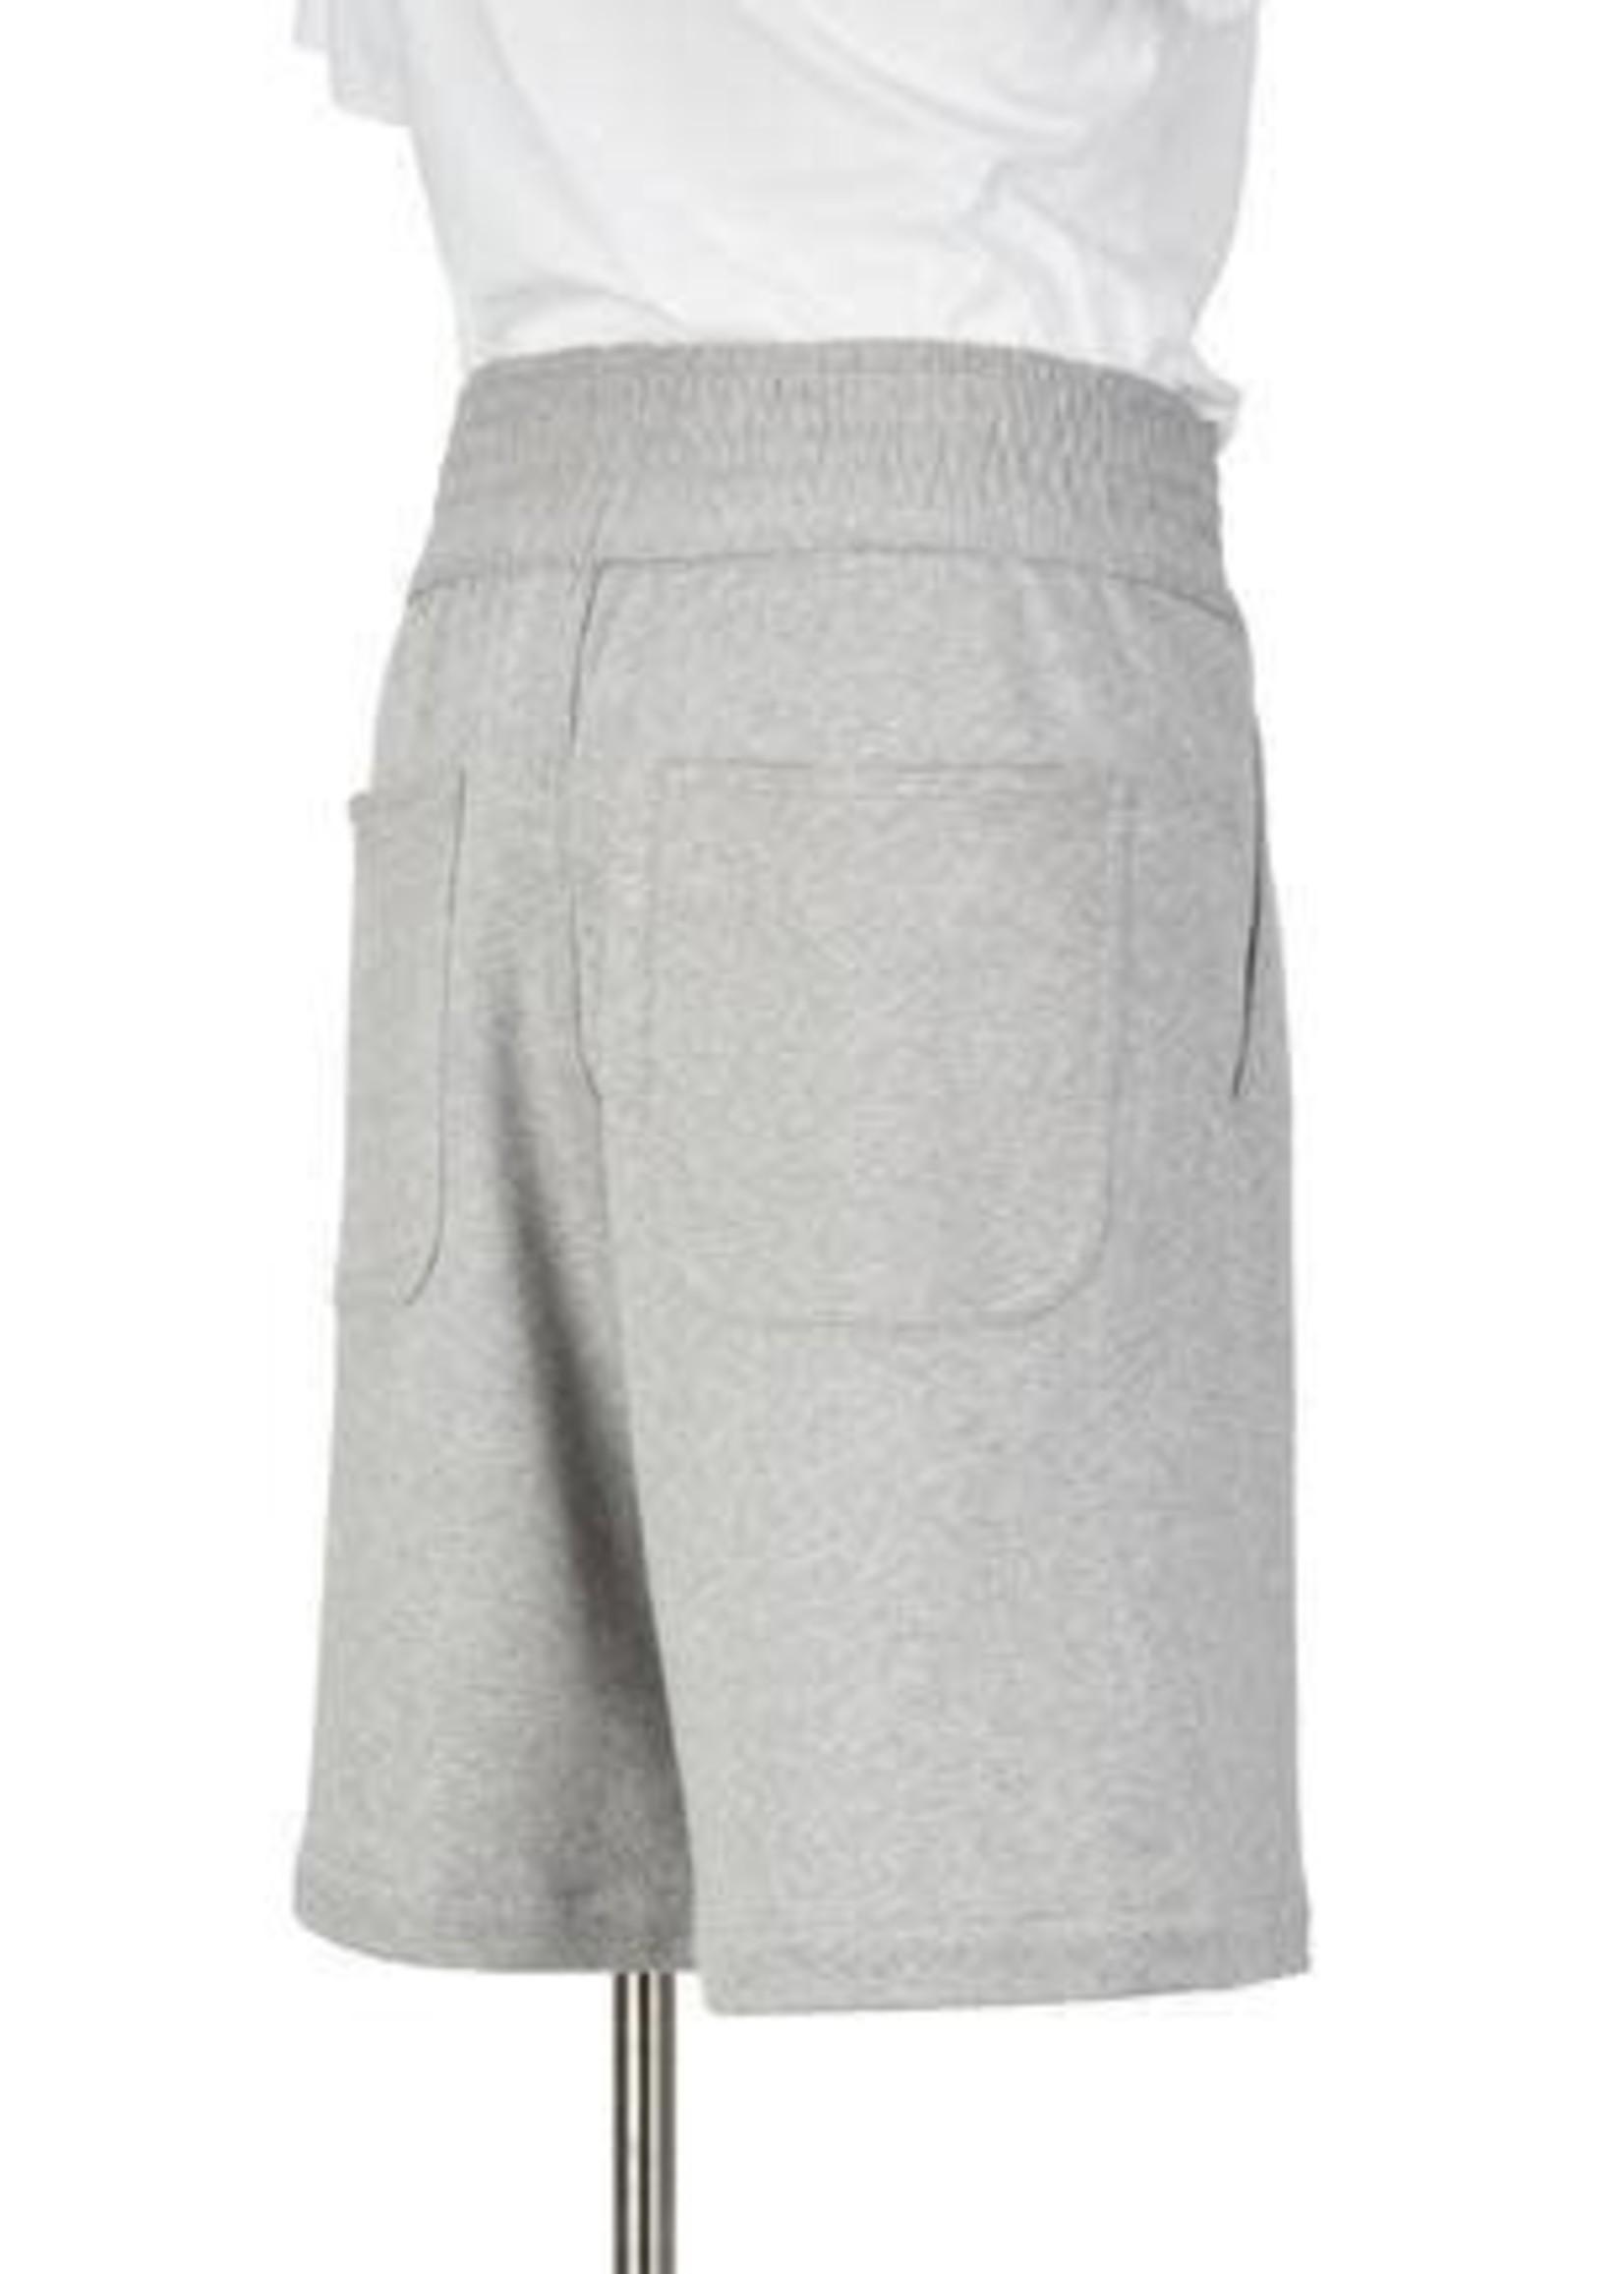 COMME des GARÇONS SHIRT Sweat Shorts in Heather Grey